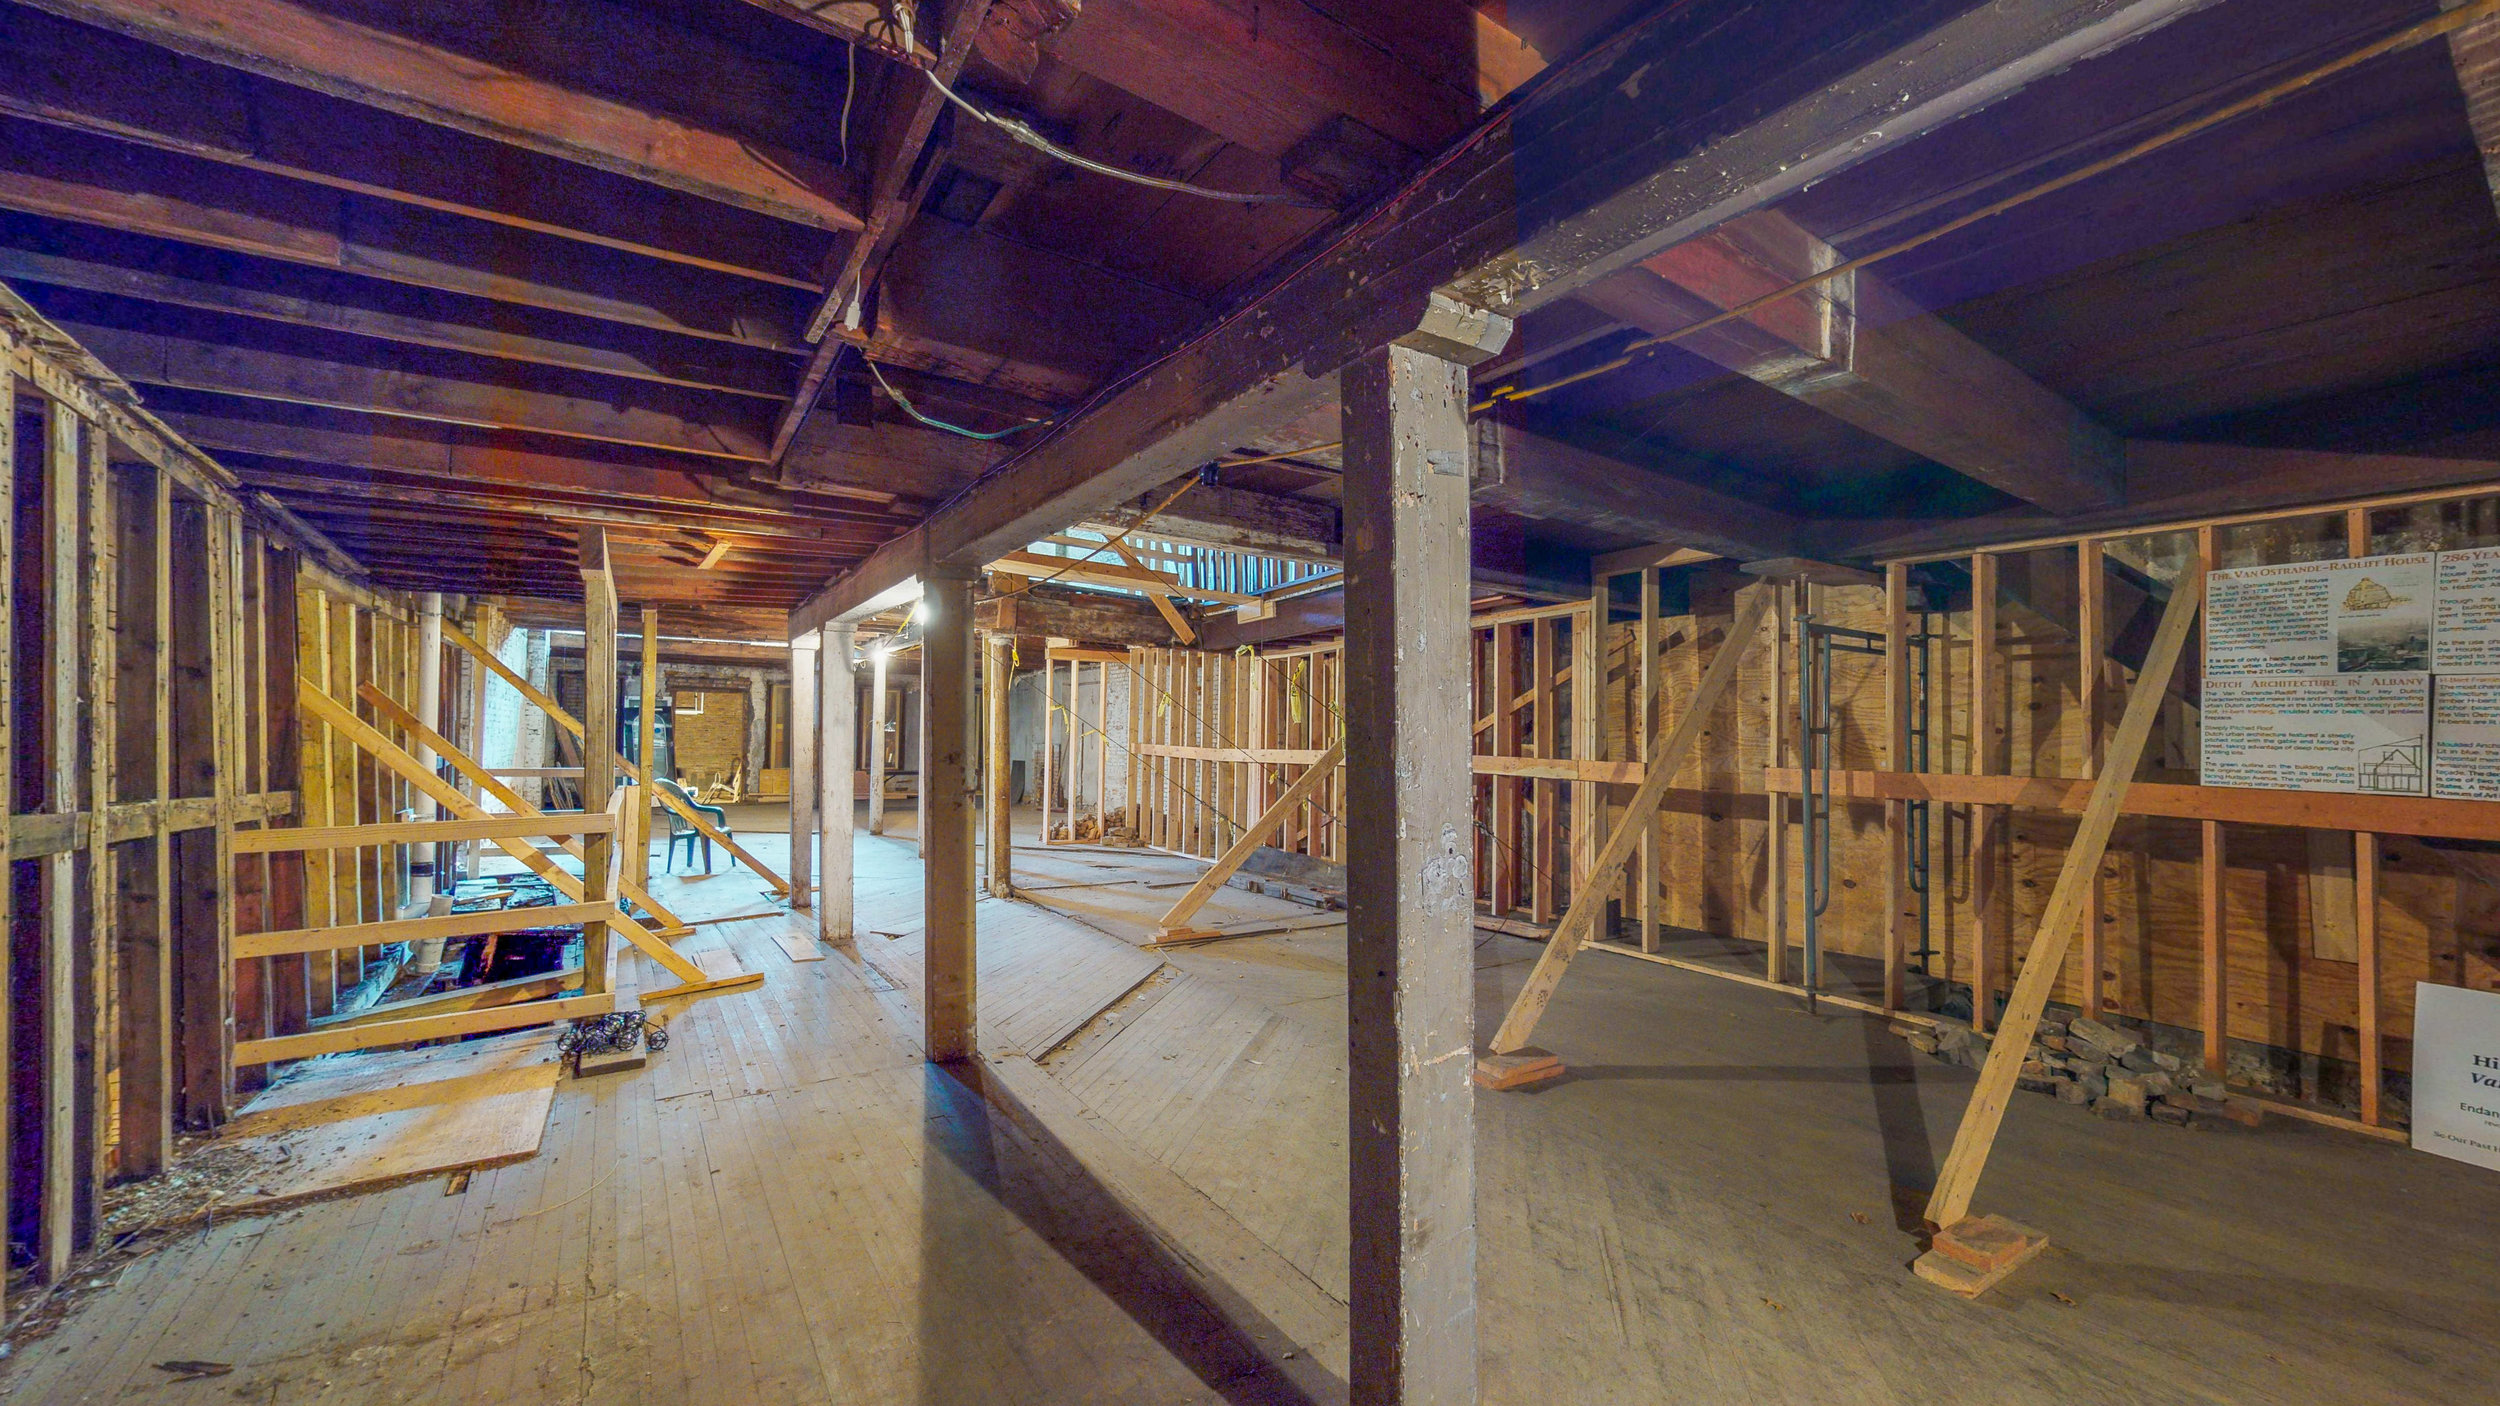 The-Van-Ostrande-Radliff-House-at-48-Hudson-08292019_122939.jpg